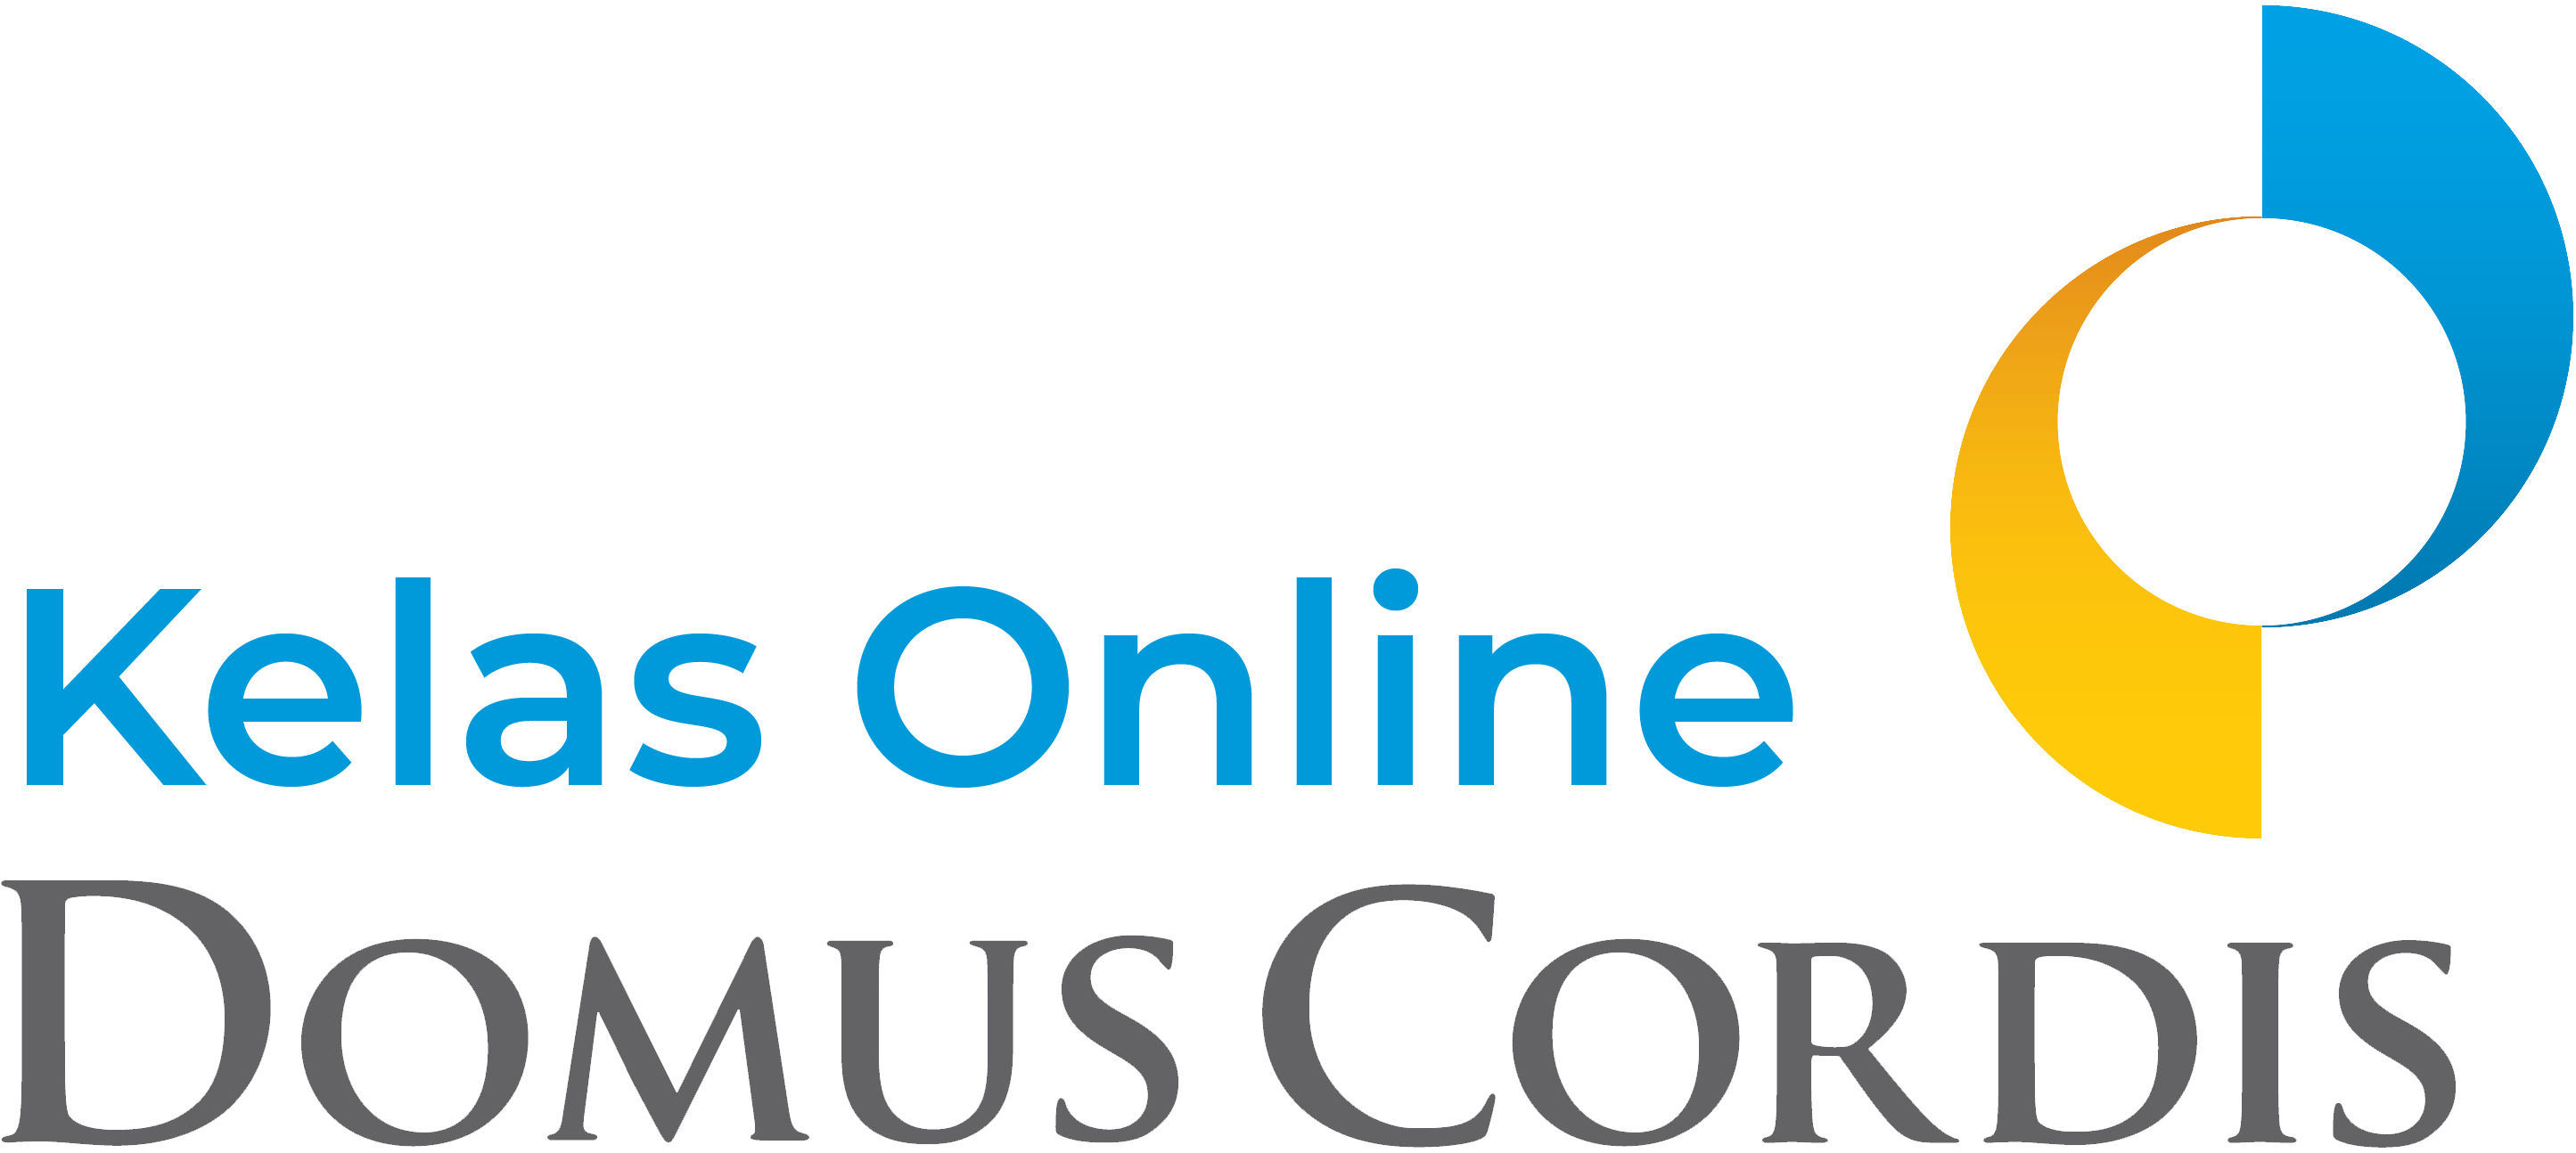 kelas online domus cordis